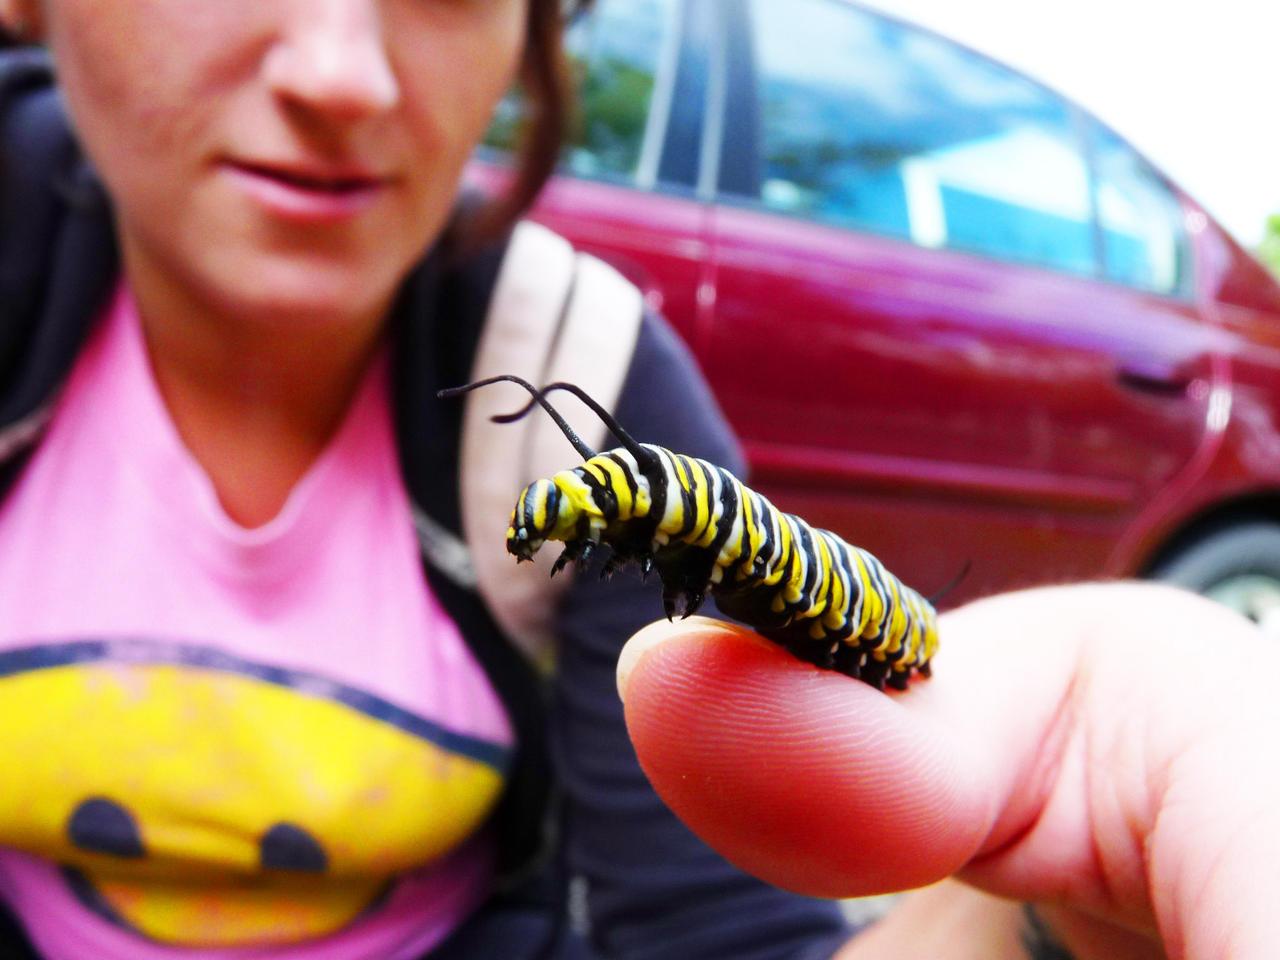 Krista and the Caterpillar by JeremiahLambertArt